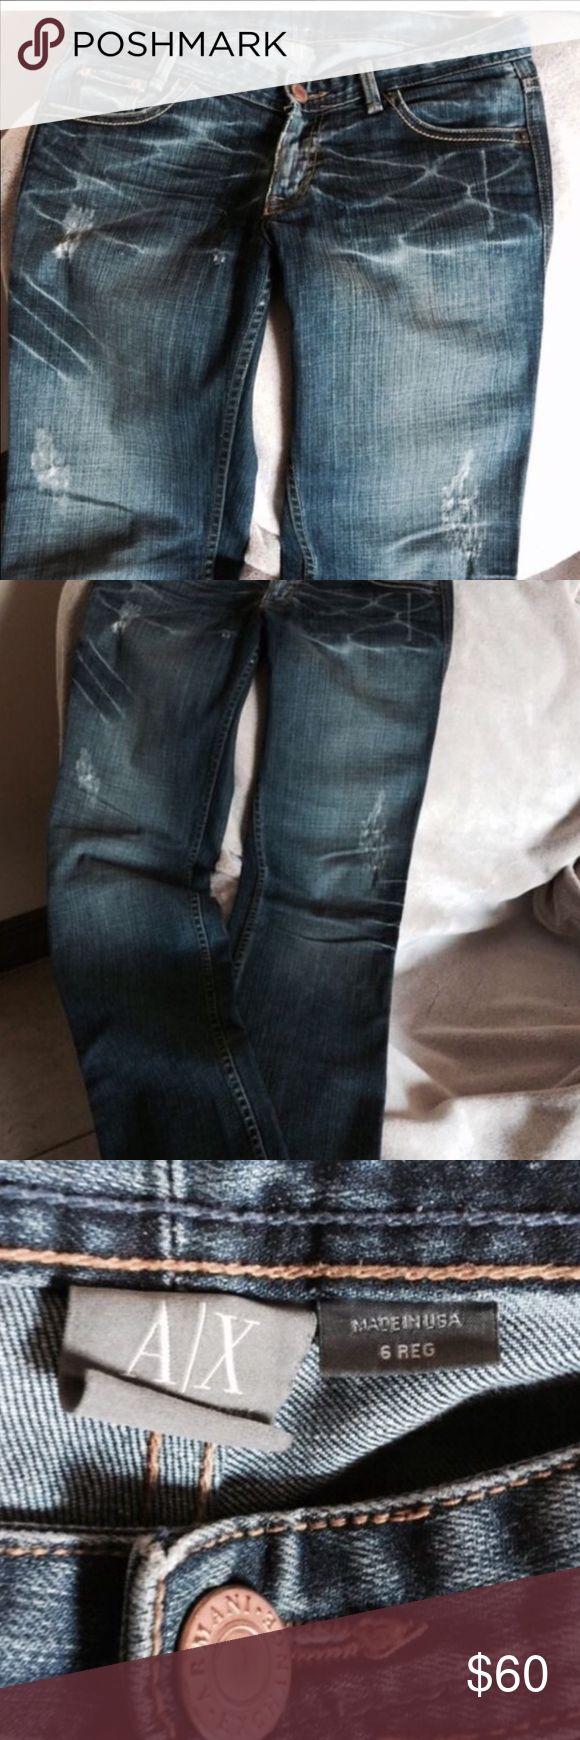 Armani Exchange Armani Exchange jeans size 6 great condition A/X Armani Exchange Jeans Boot Cut